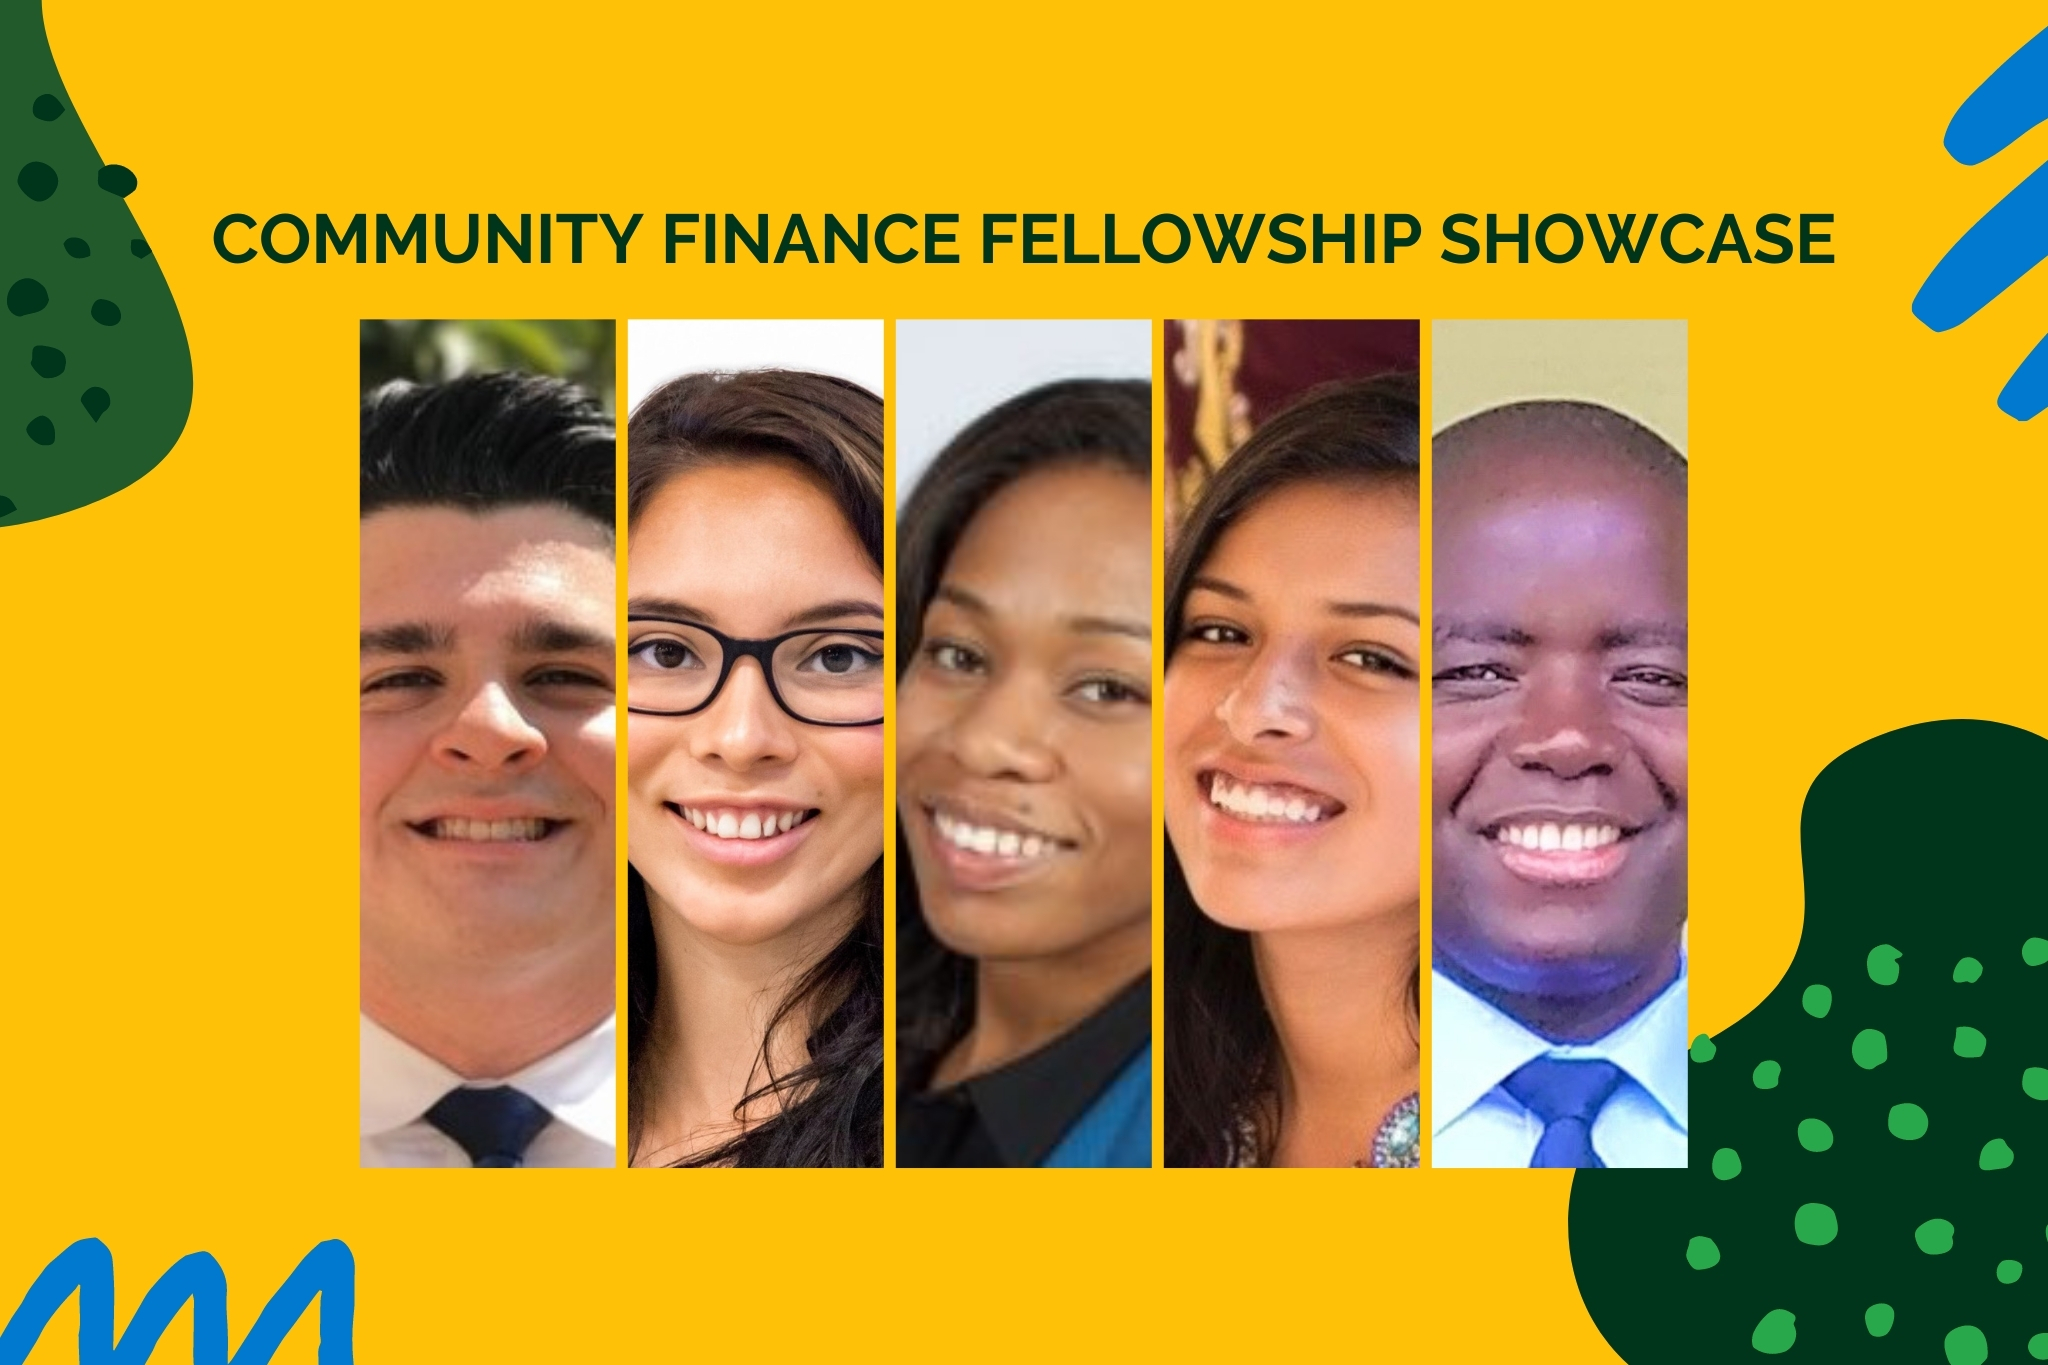 Community Finance Fellowship showcase 2020